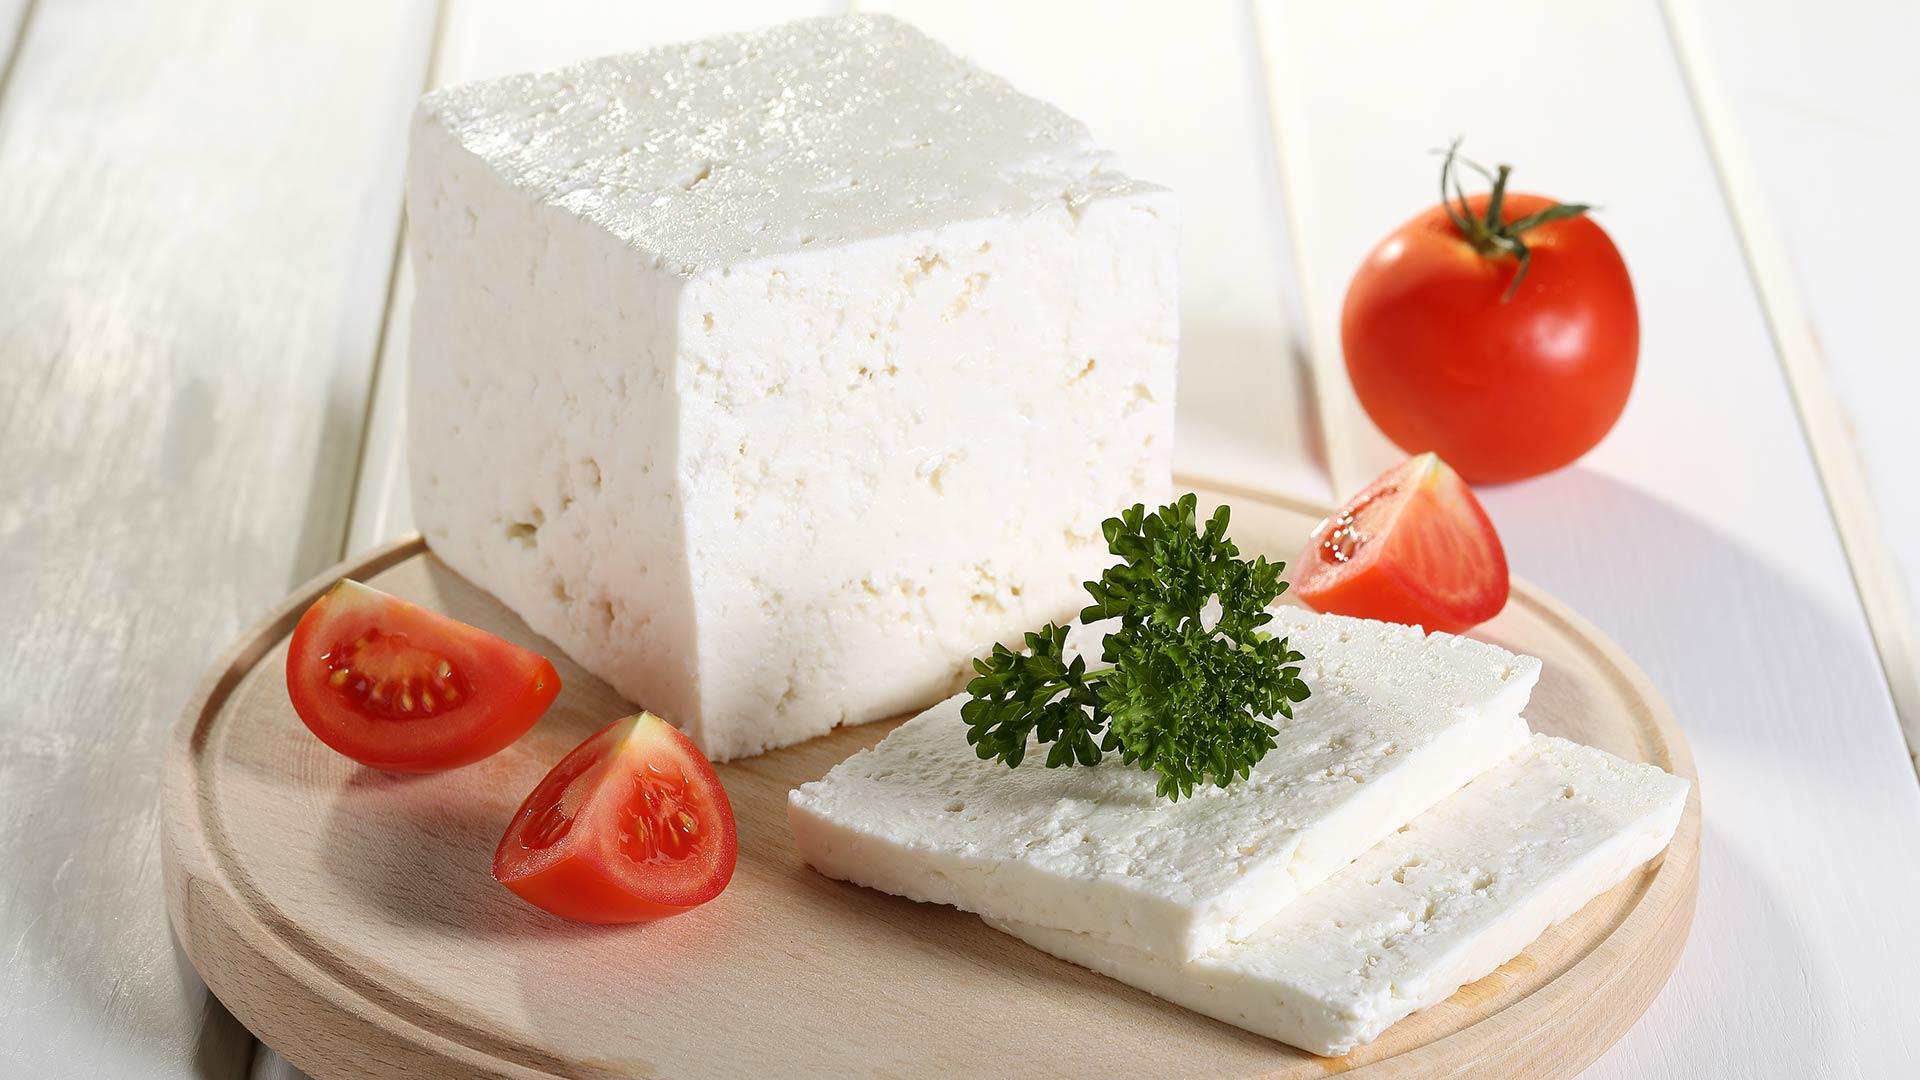 White Cheese (Beyaz Peynir). (Image Credit-Online Breakfast Products)